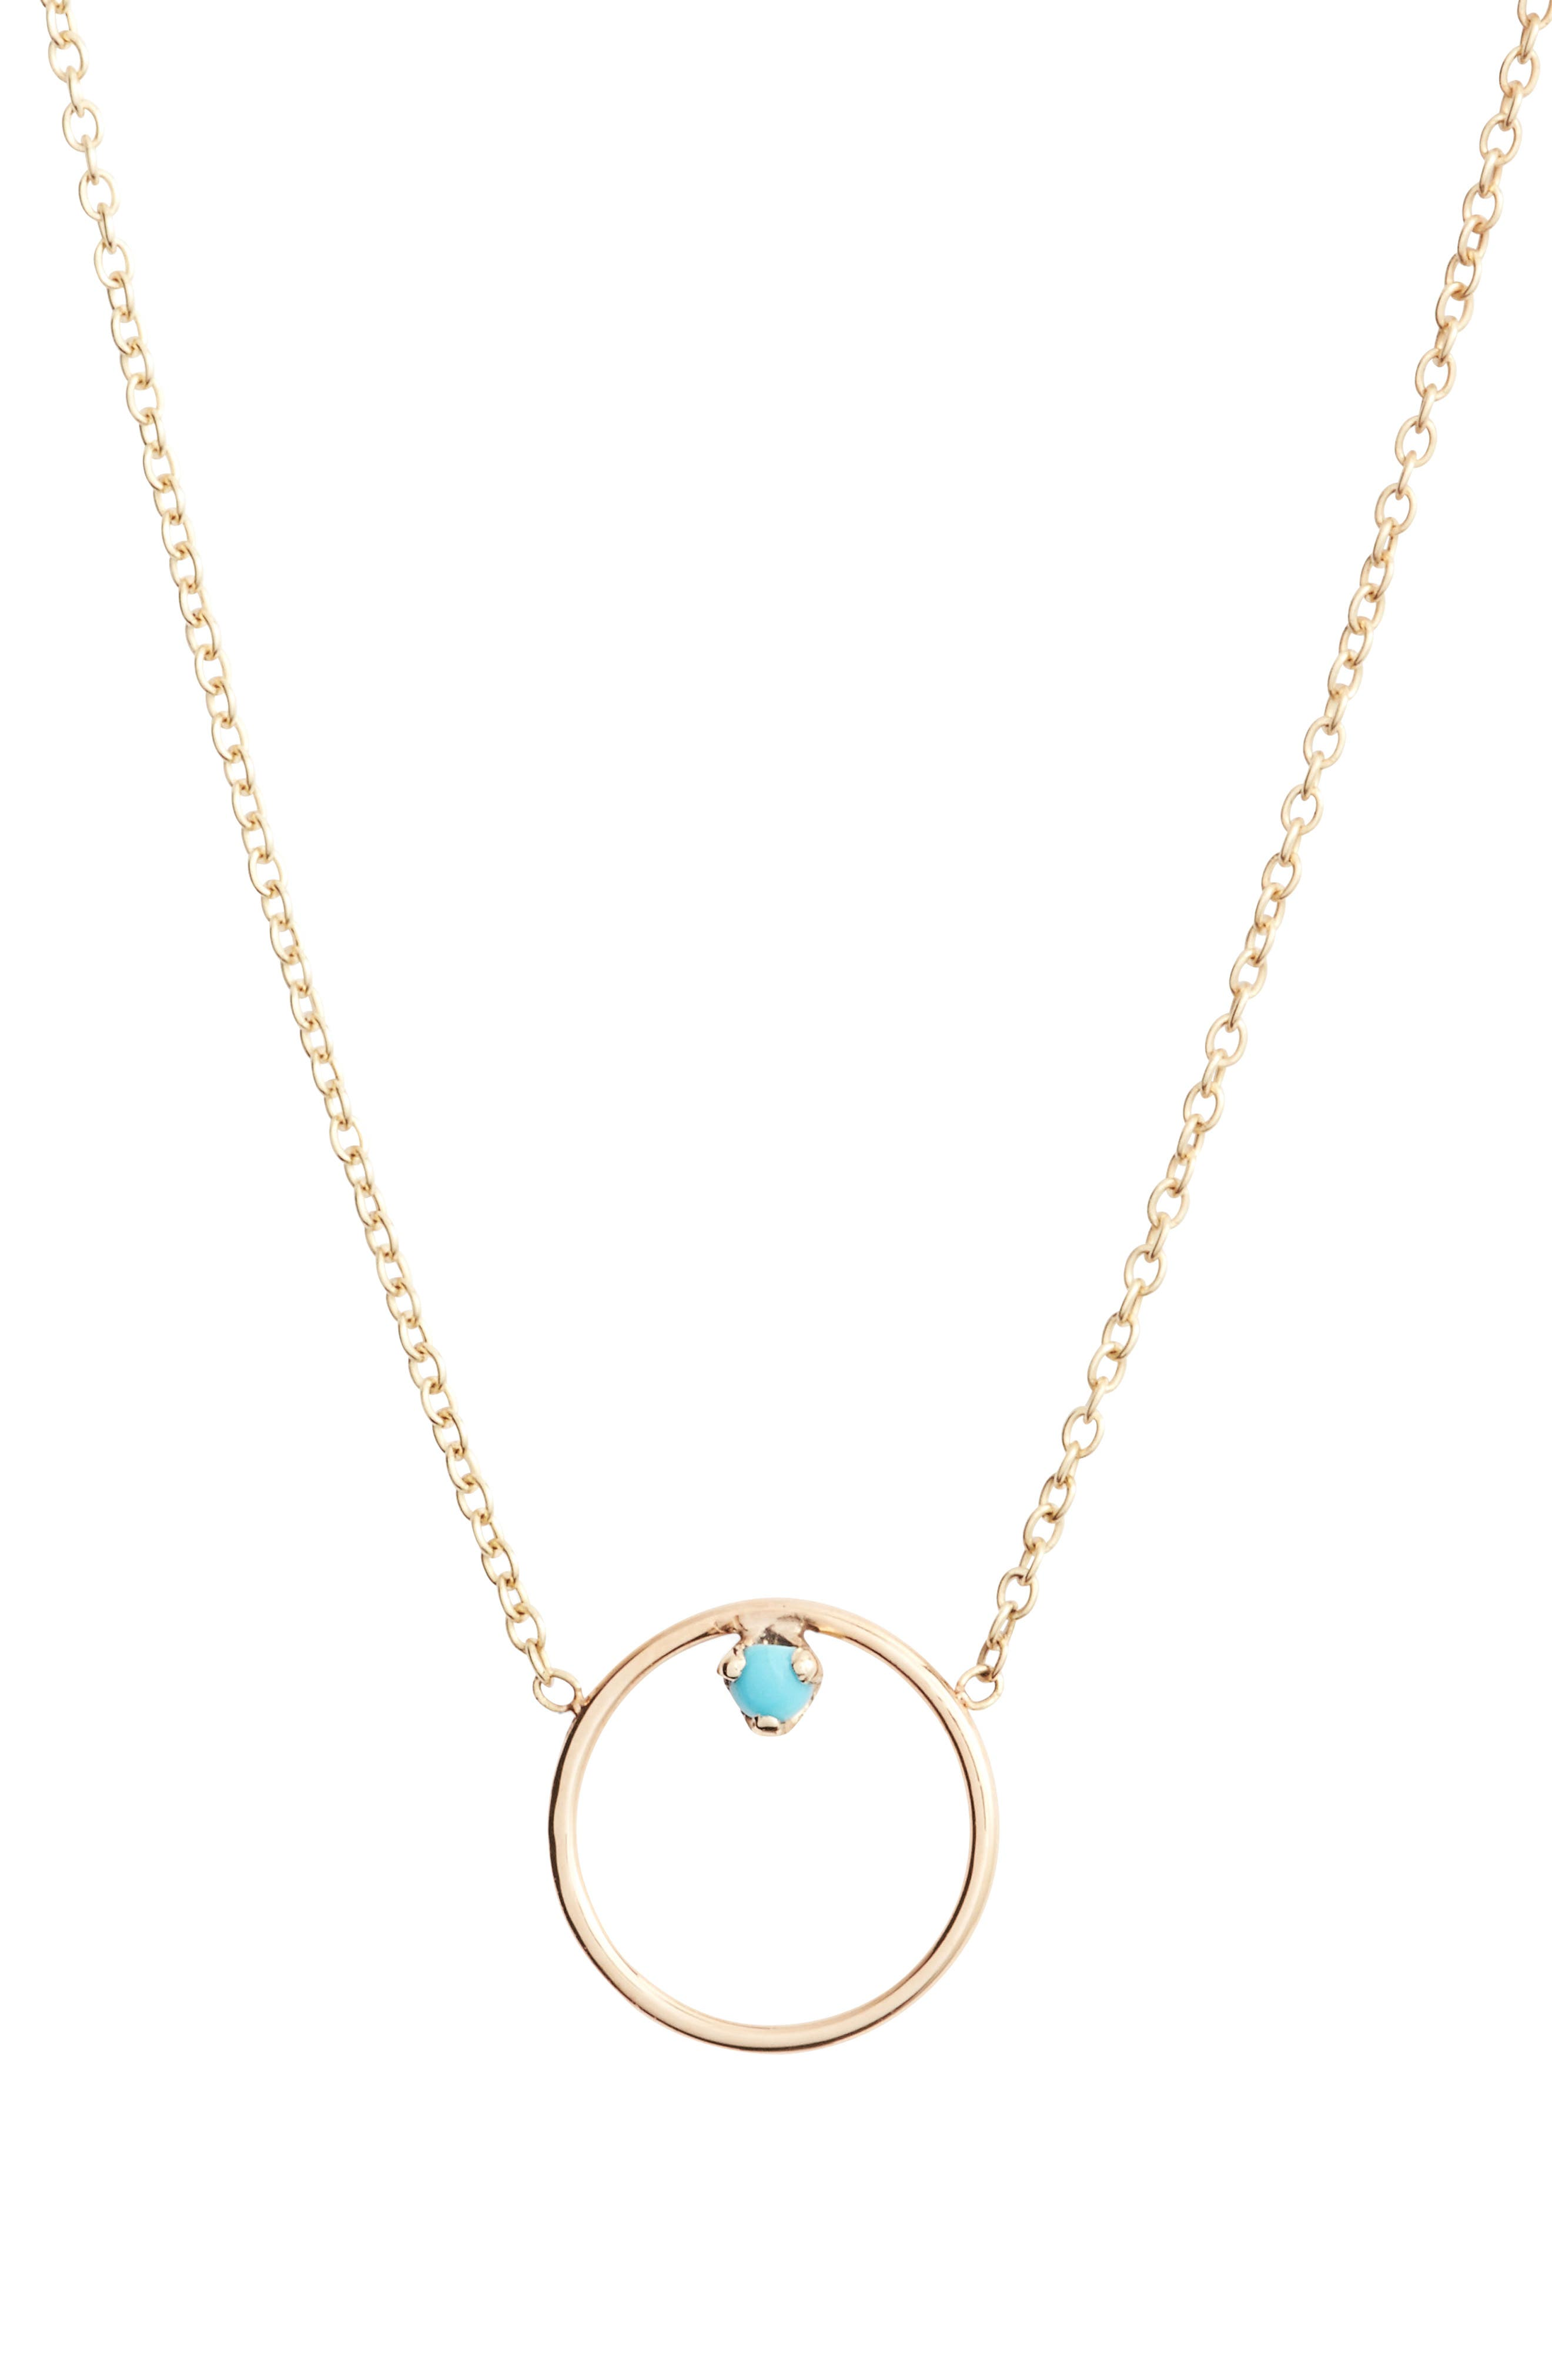 Zoë Chicco Turquoise Circle Pendant Necklace